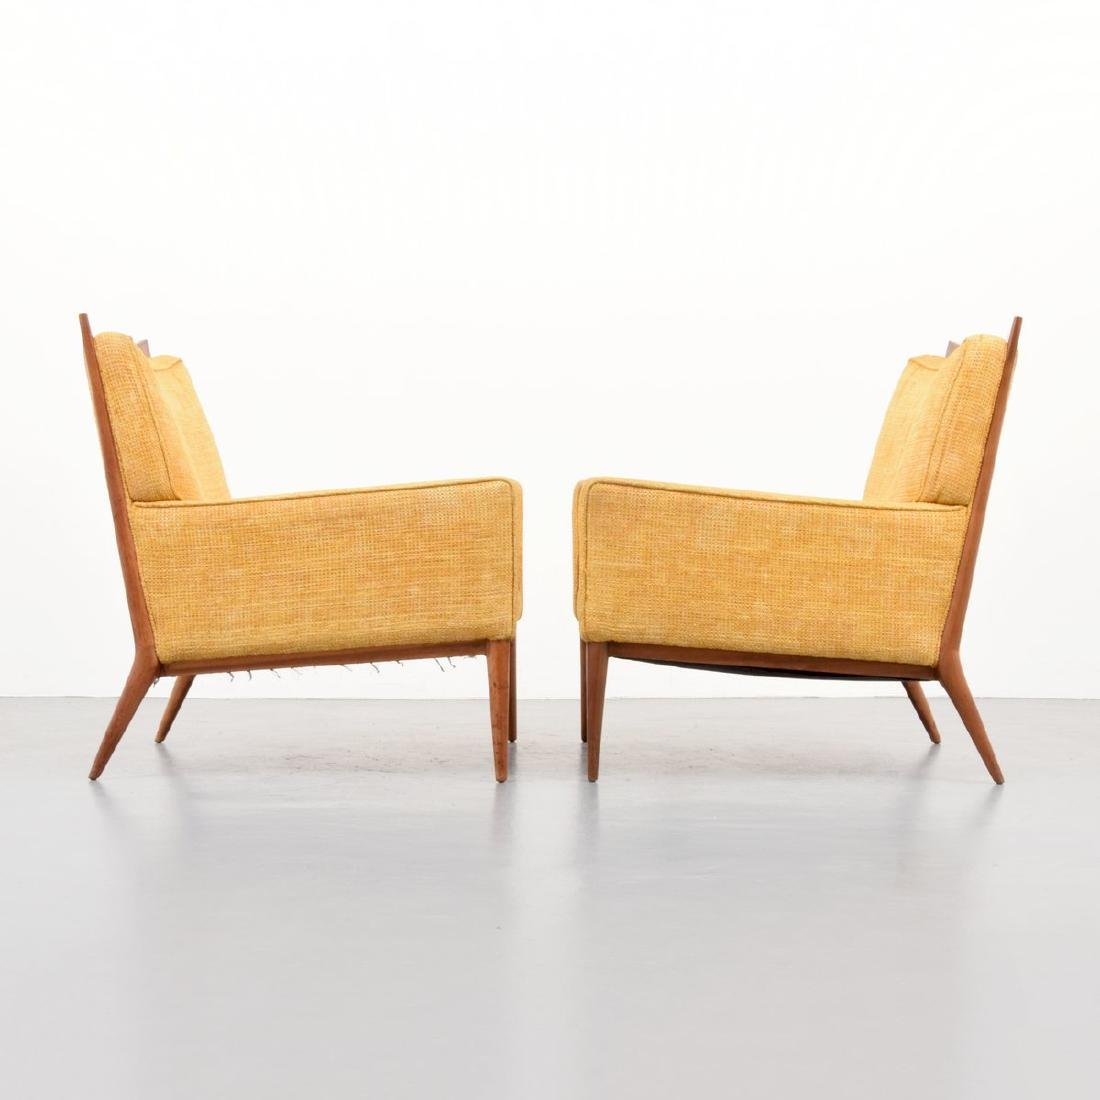 Pair of Paul McCobb Lounge Chairs - 4